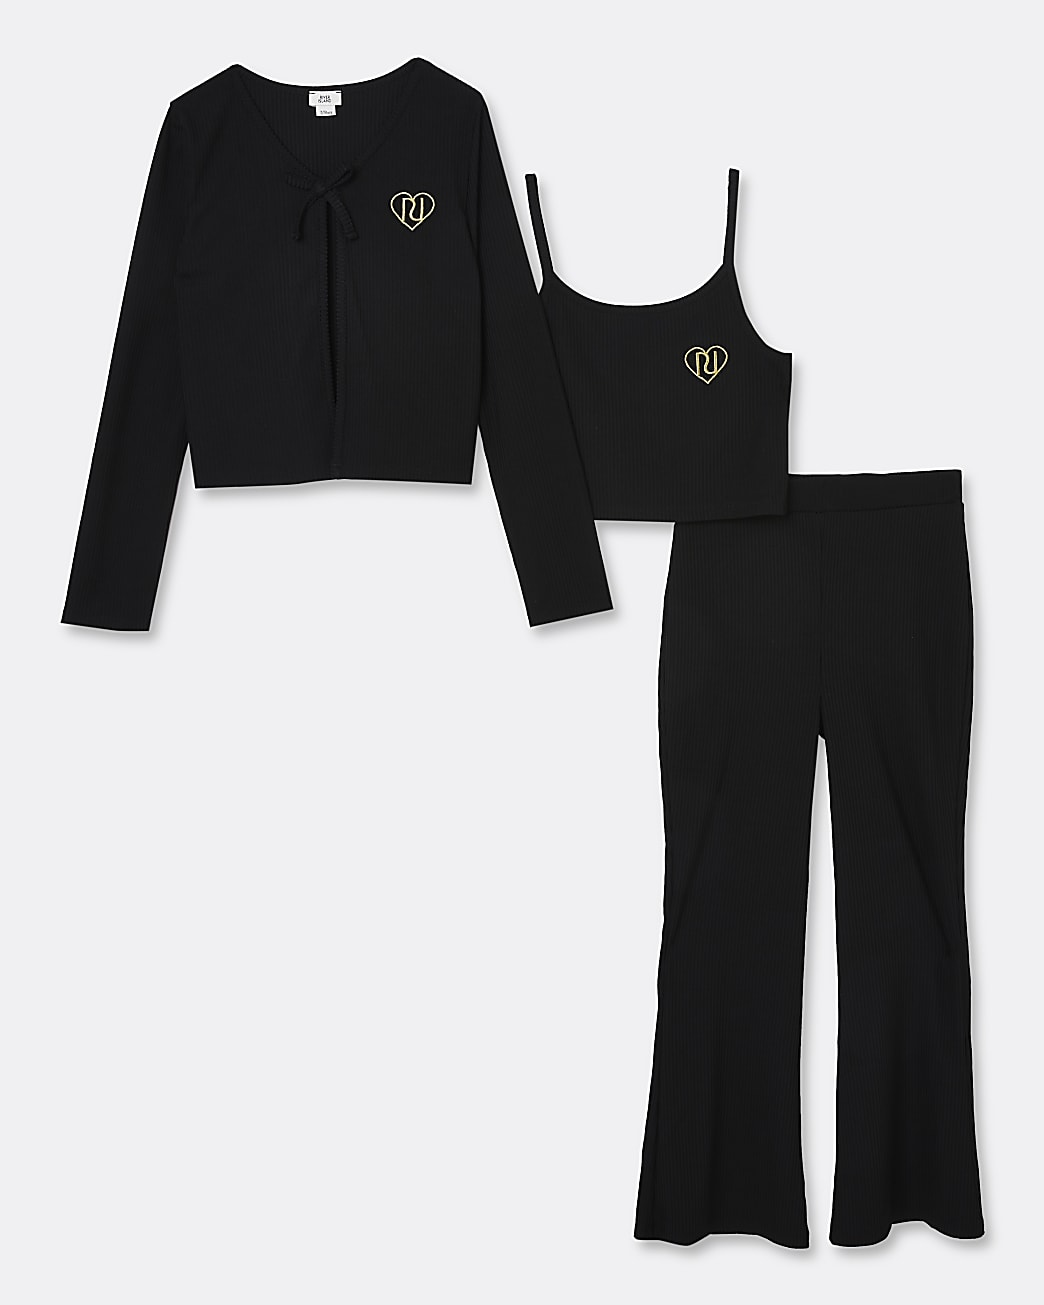 Girls black RI ribbed cardigan 3 piece outfit